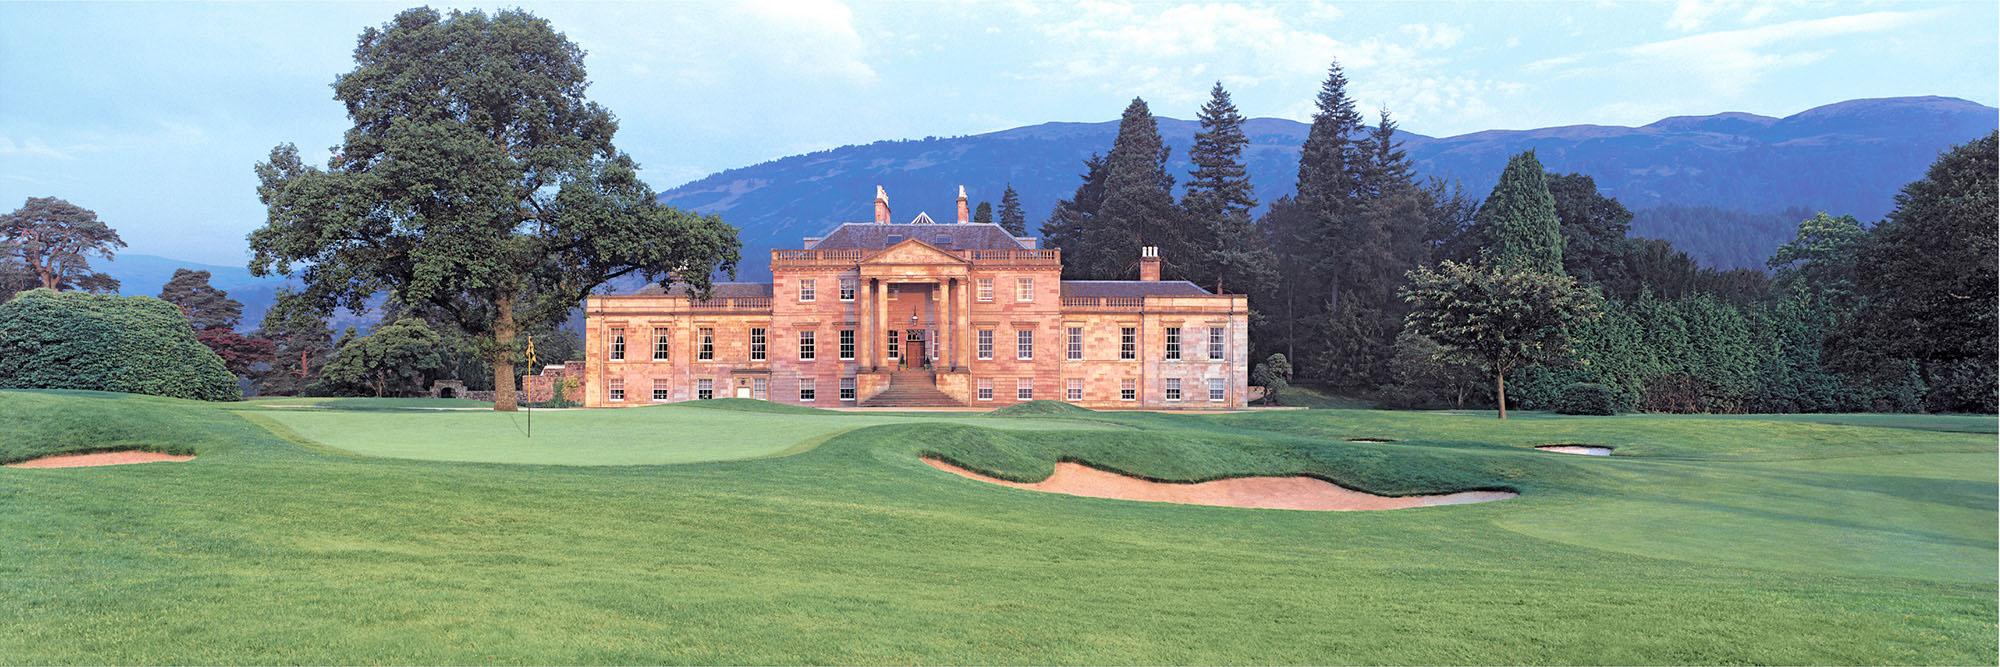 Golf Course Image - Loch Lomond No. 8